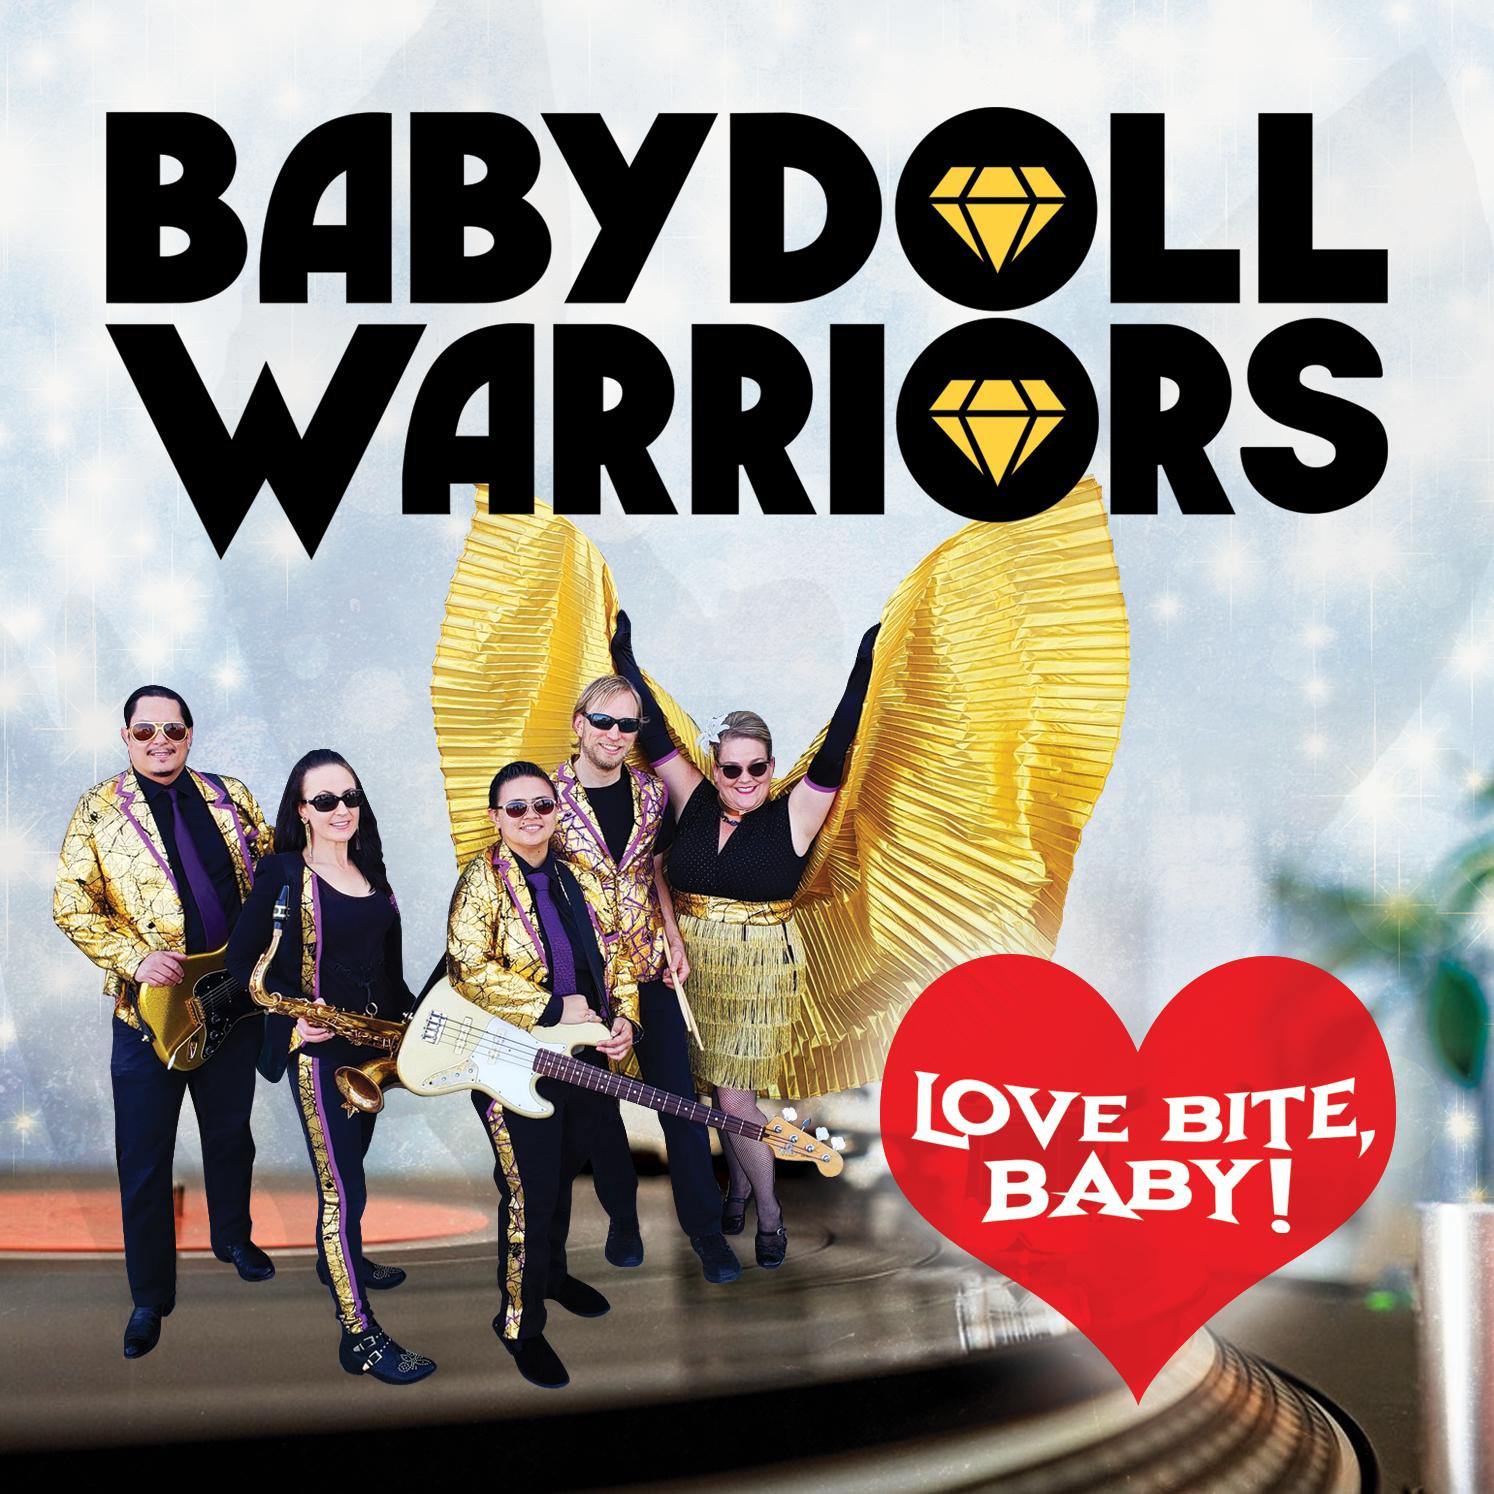 BabydollWarriors_LoveBiteBabyEP_front.png